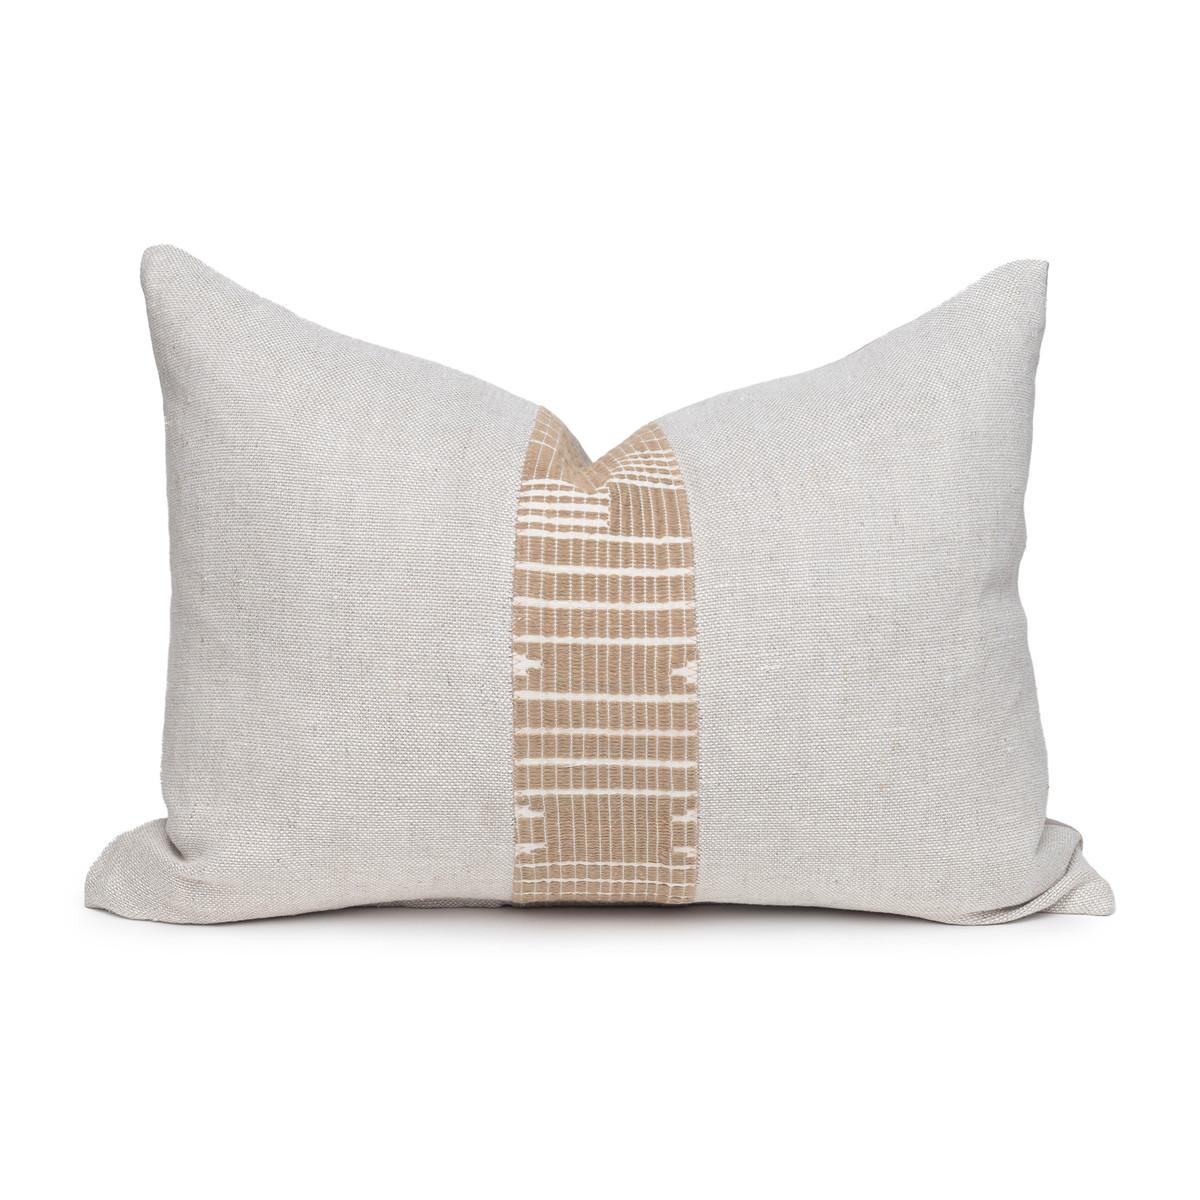 Triton Natural Linen and Aso Oke Lumbar Pillow - 1622- Front View